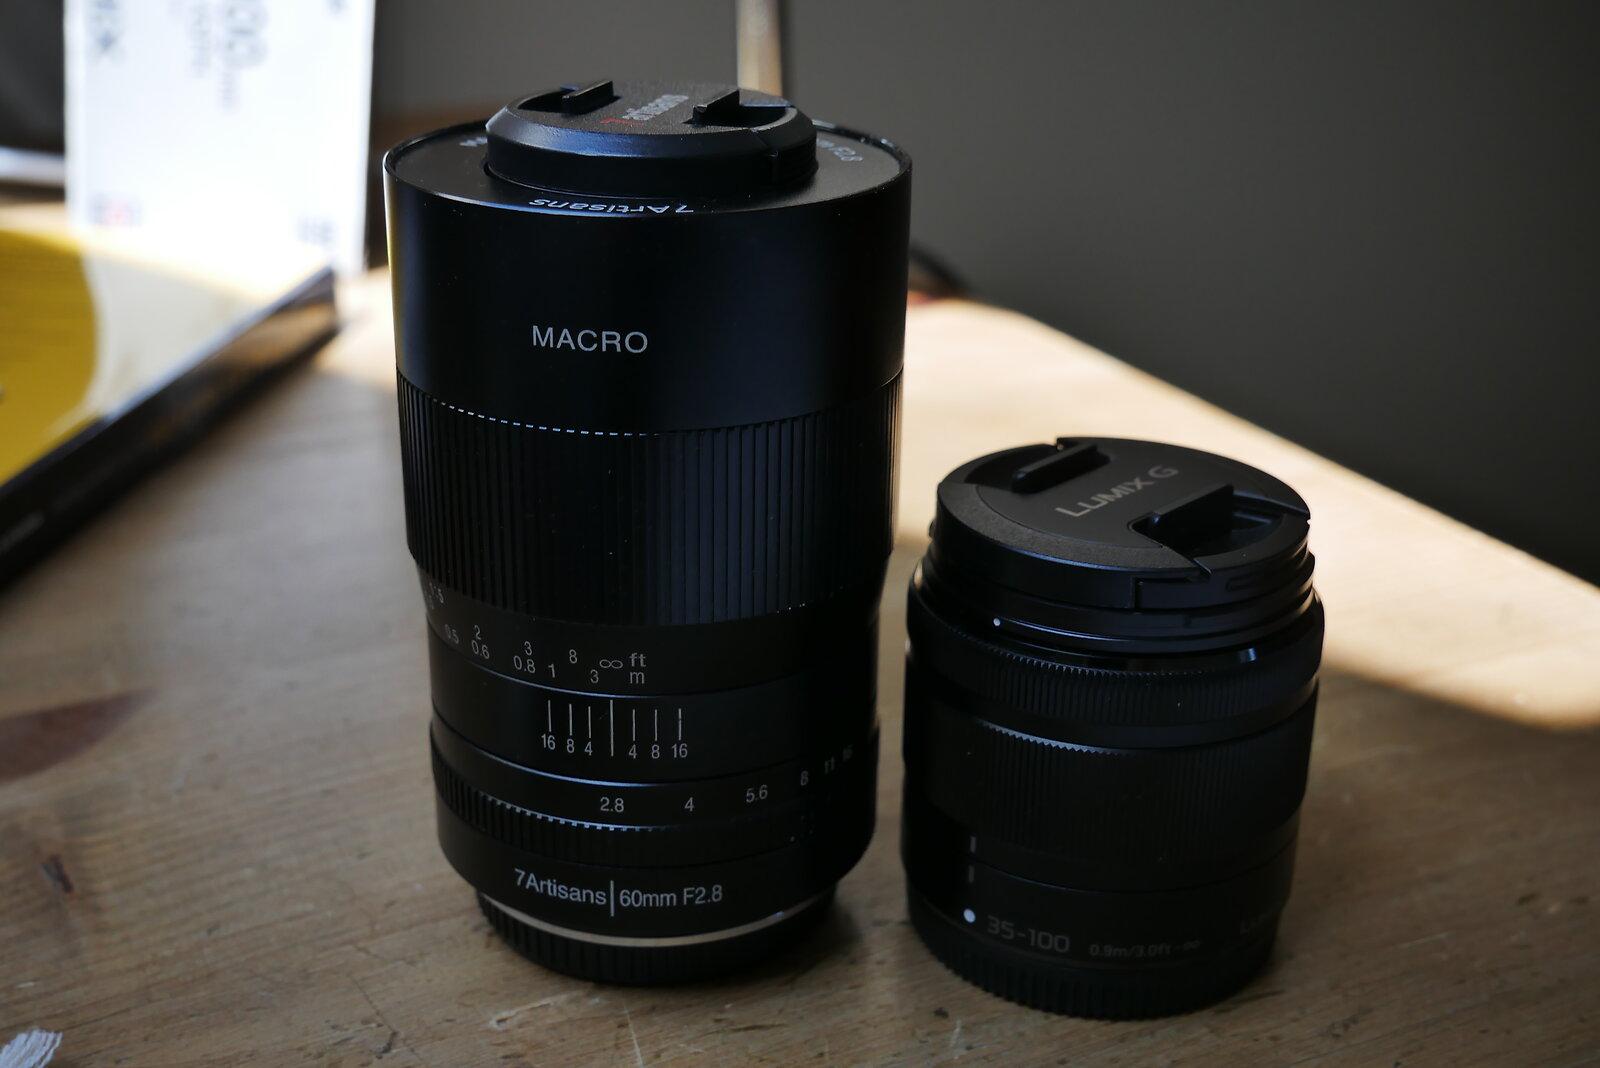 P1070034.JPG